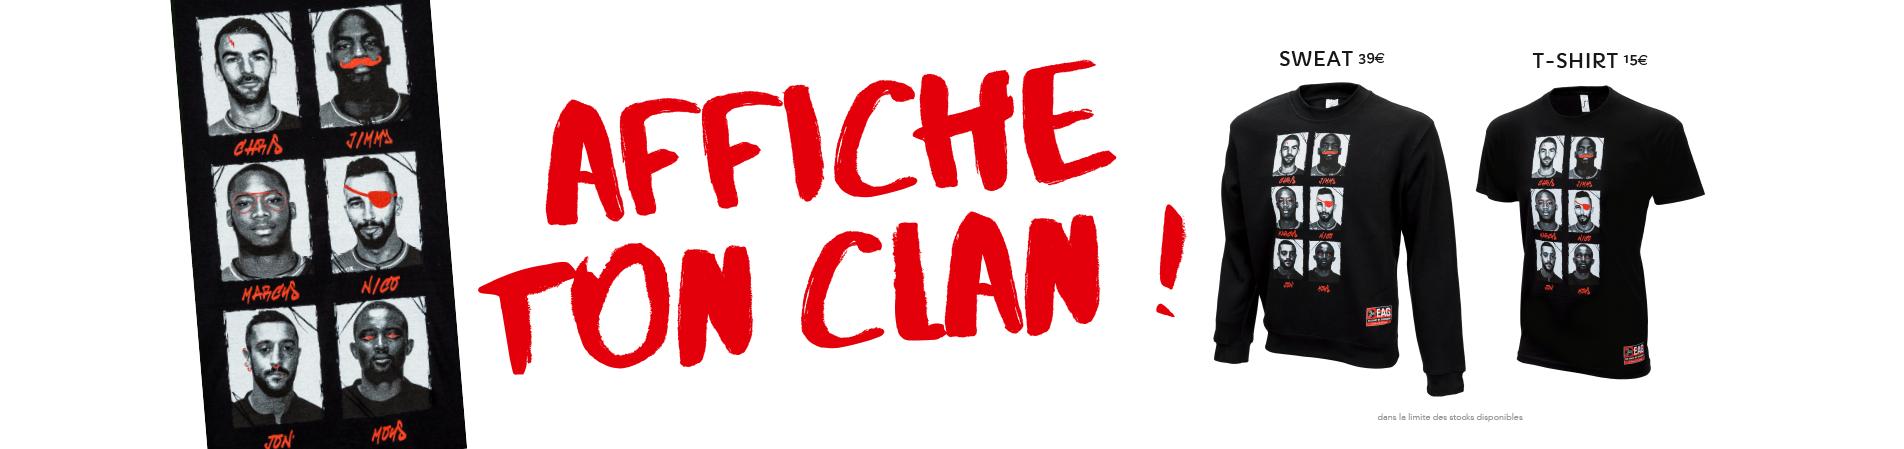 Affiche ton clan!